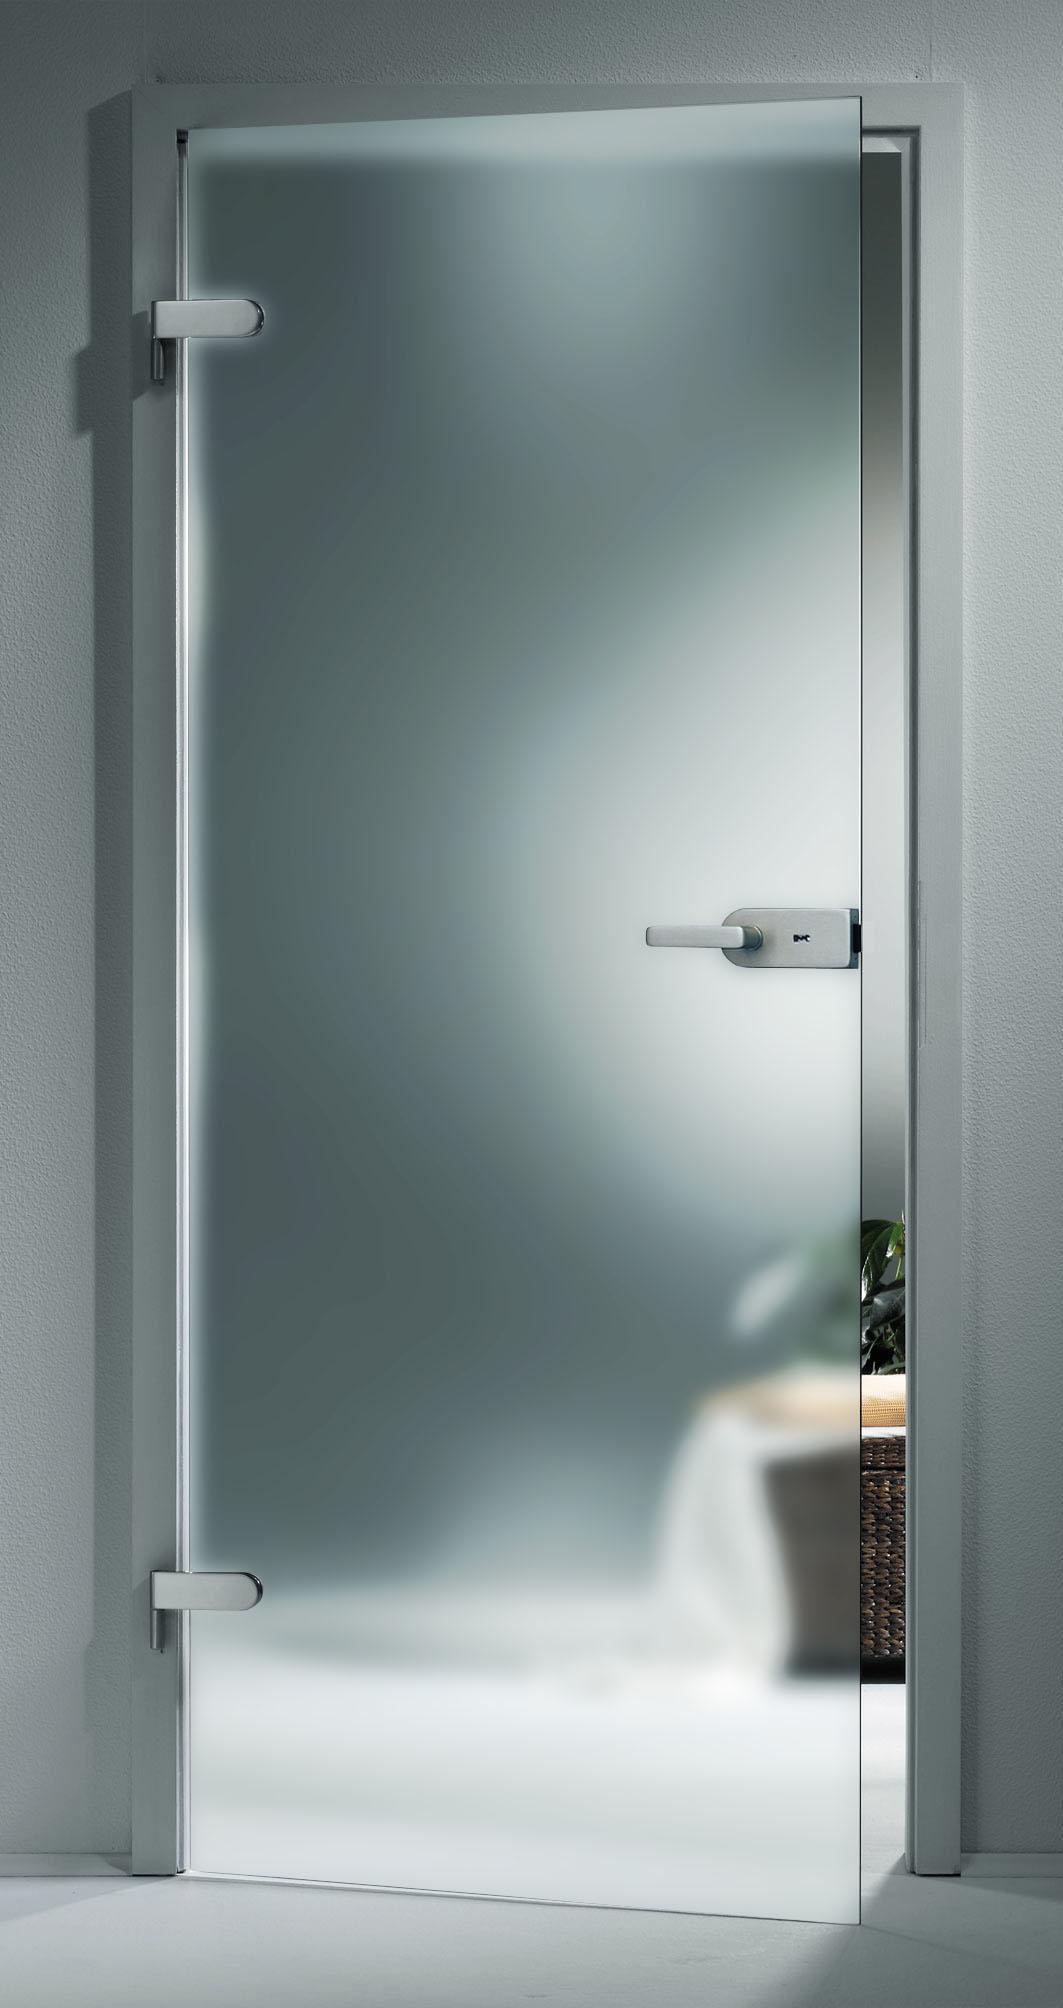 glasschiebet r system invisible visioglas. Black Bedroom Furniture Sets. Home Design Ideas